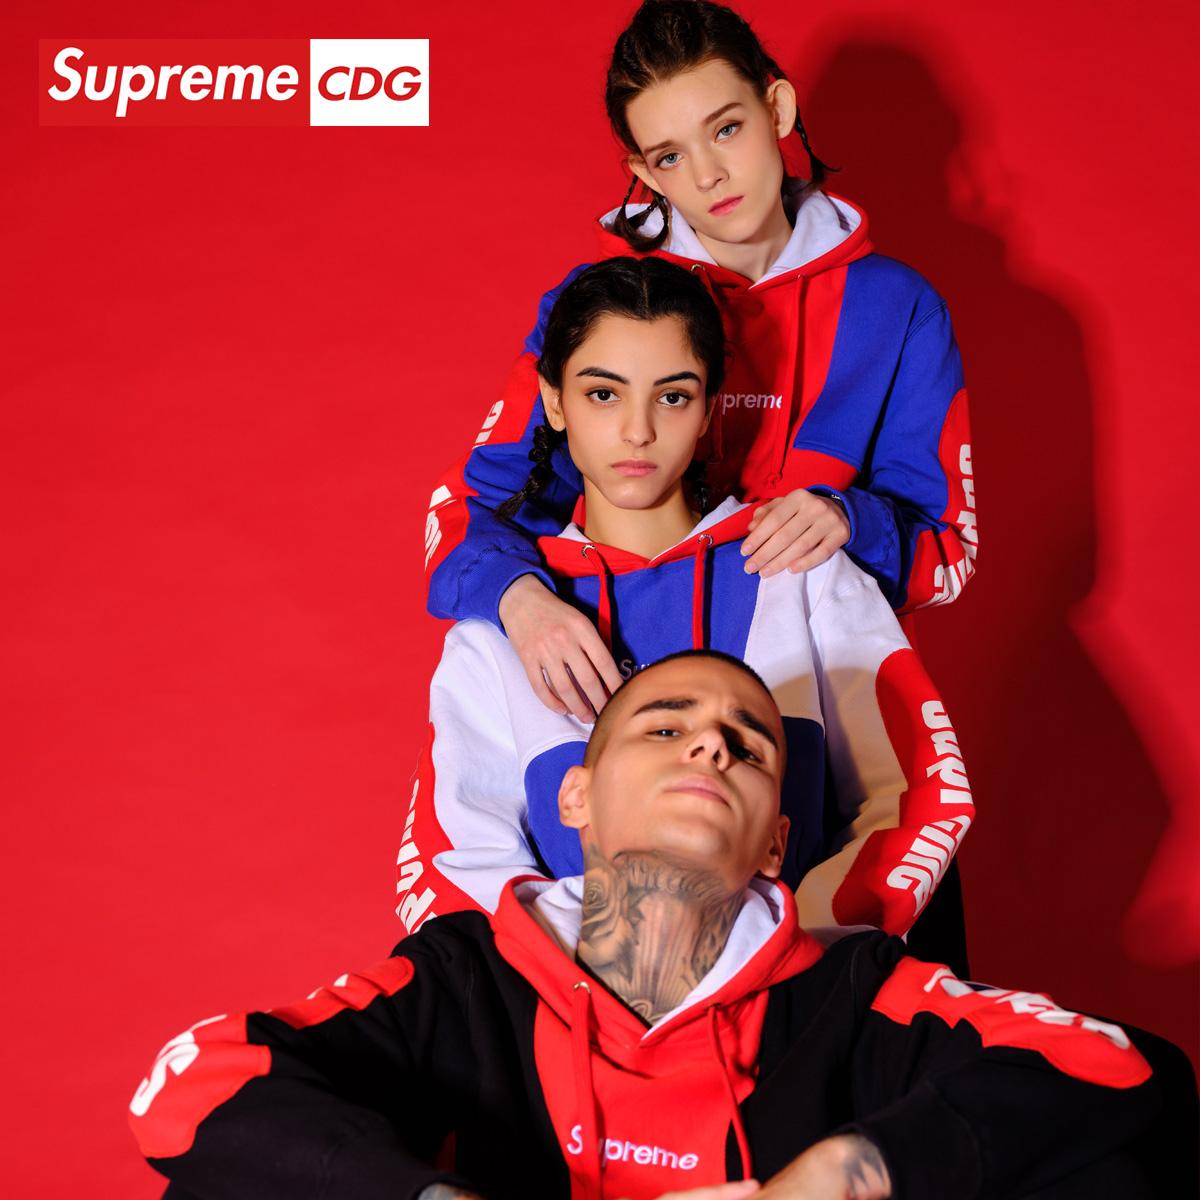 Supreme CDG 2020年春季新款印花字母情侶中性連帽衛衣男女款上衣